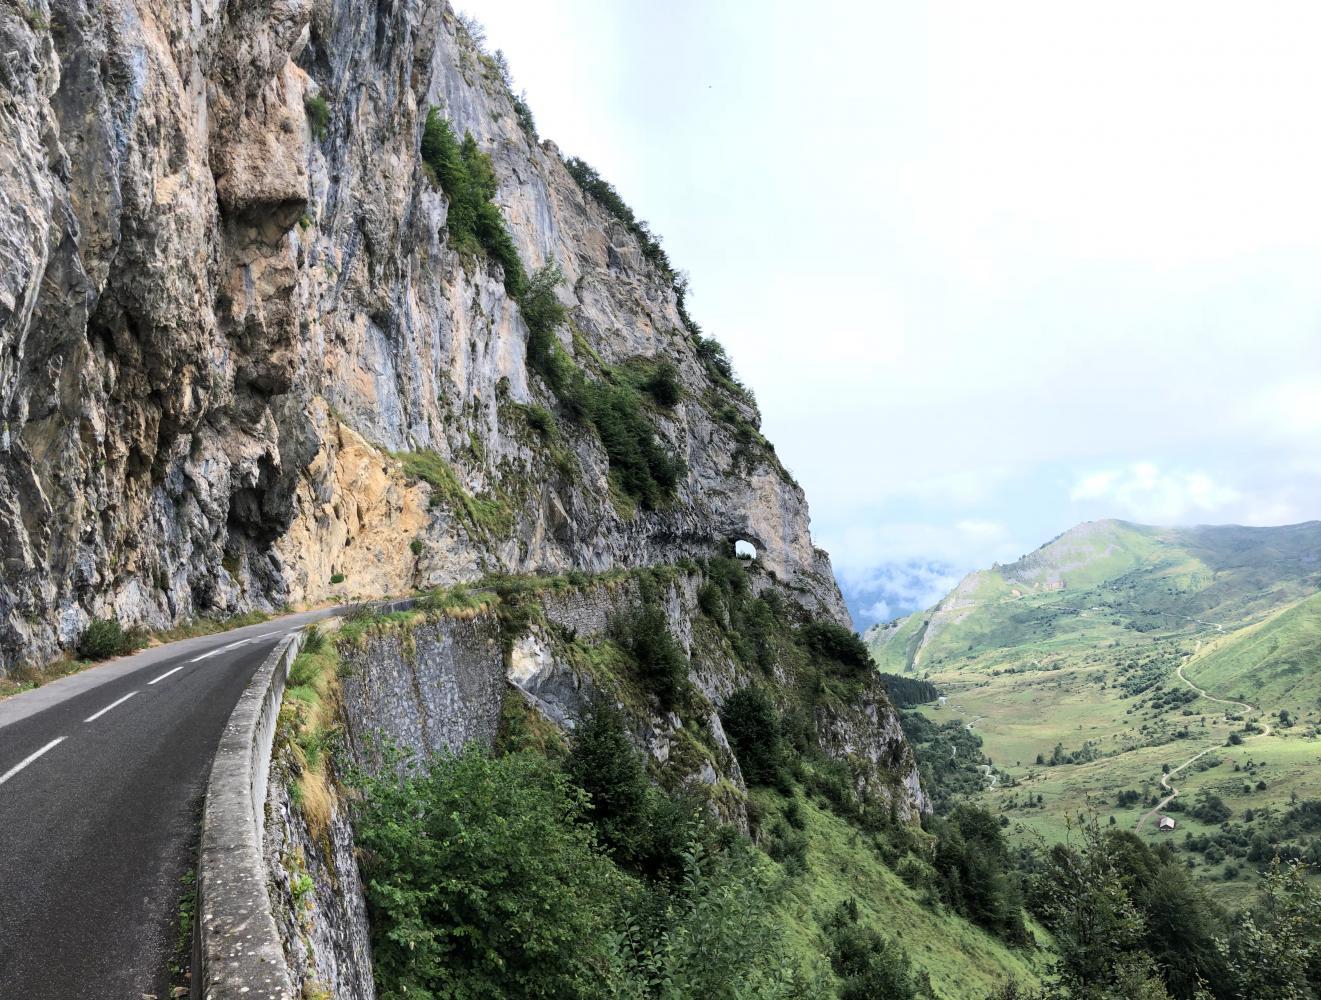 Col d'Aubisque - Argelès-Gazost Bike Climb - PJAMM Cycling